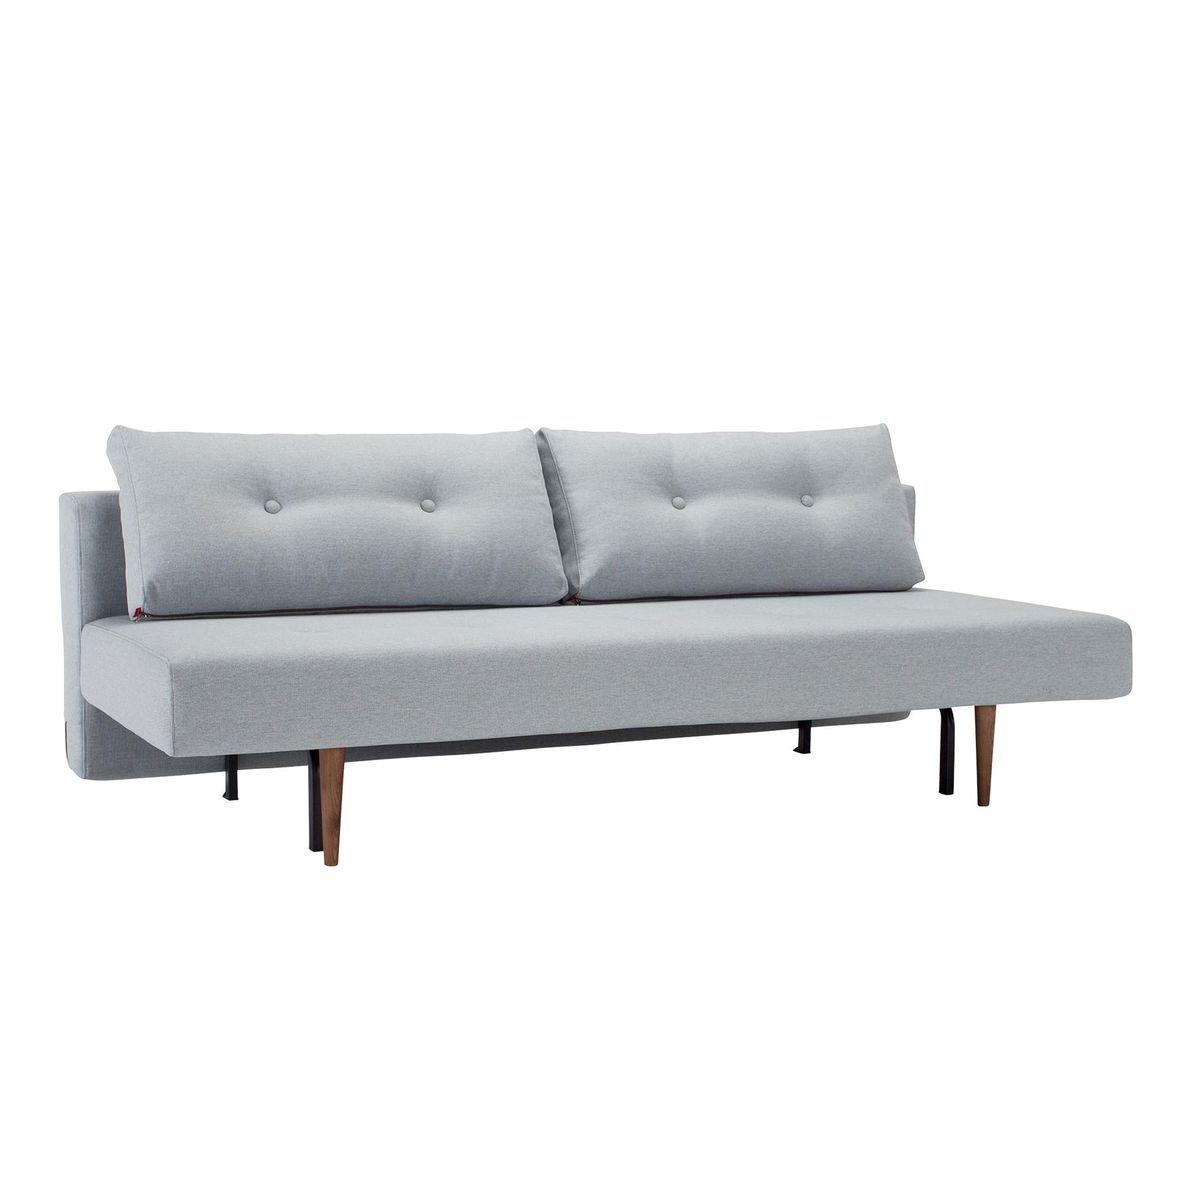 Recast sofa bed innovation for Sofa hellblau